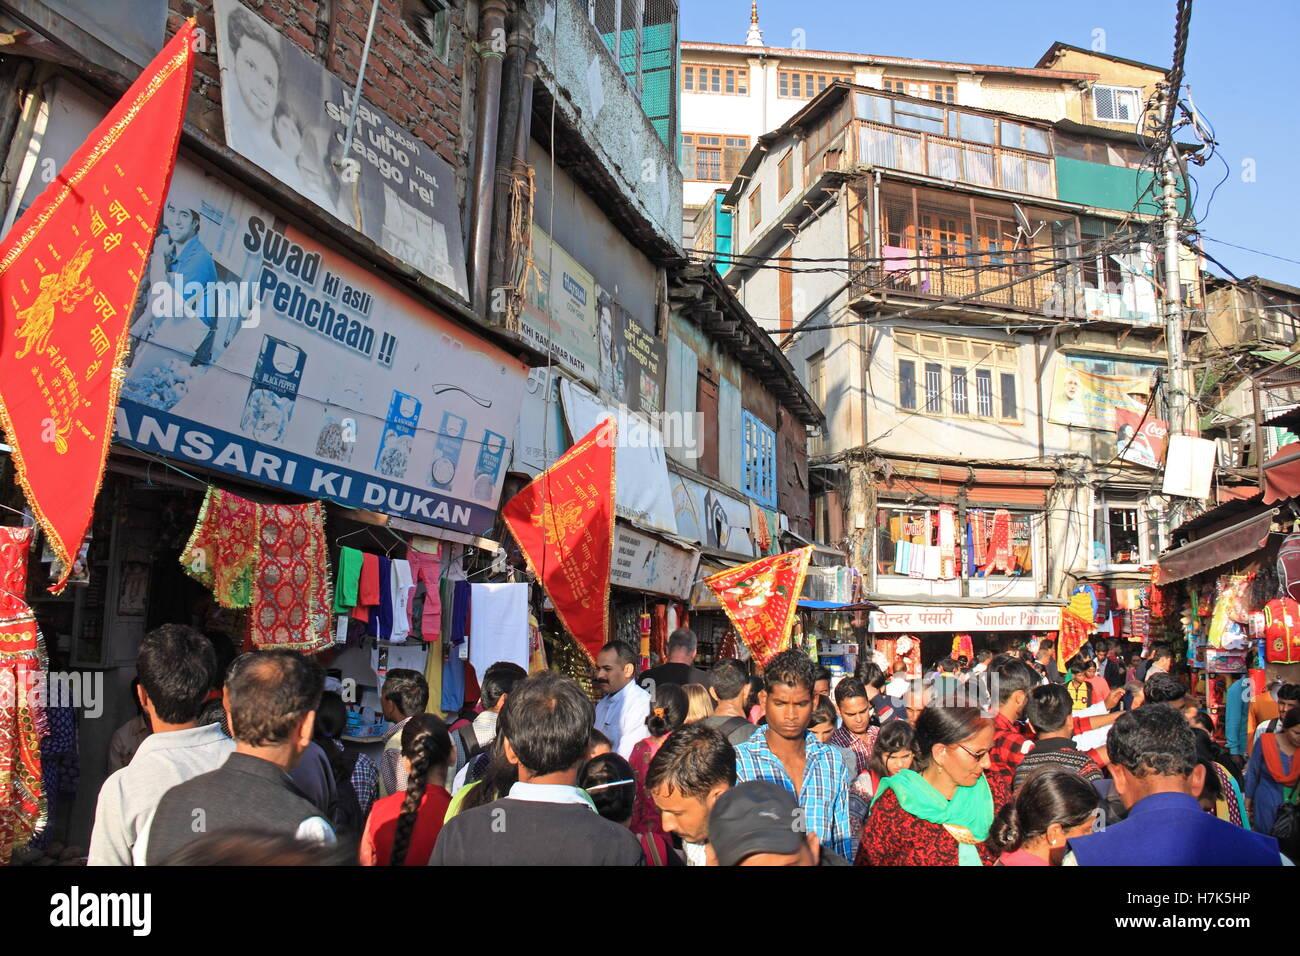 Lower Bazar, Shimla, Himachal Pradesh, India, Indian subcontinent, South Asia - Stock Image